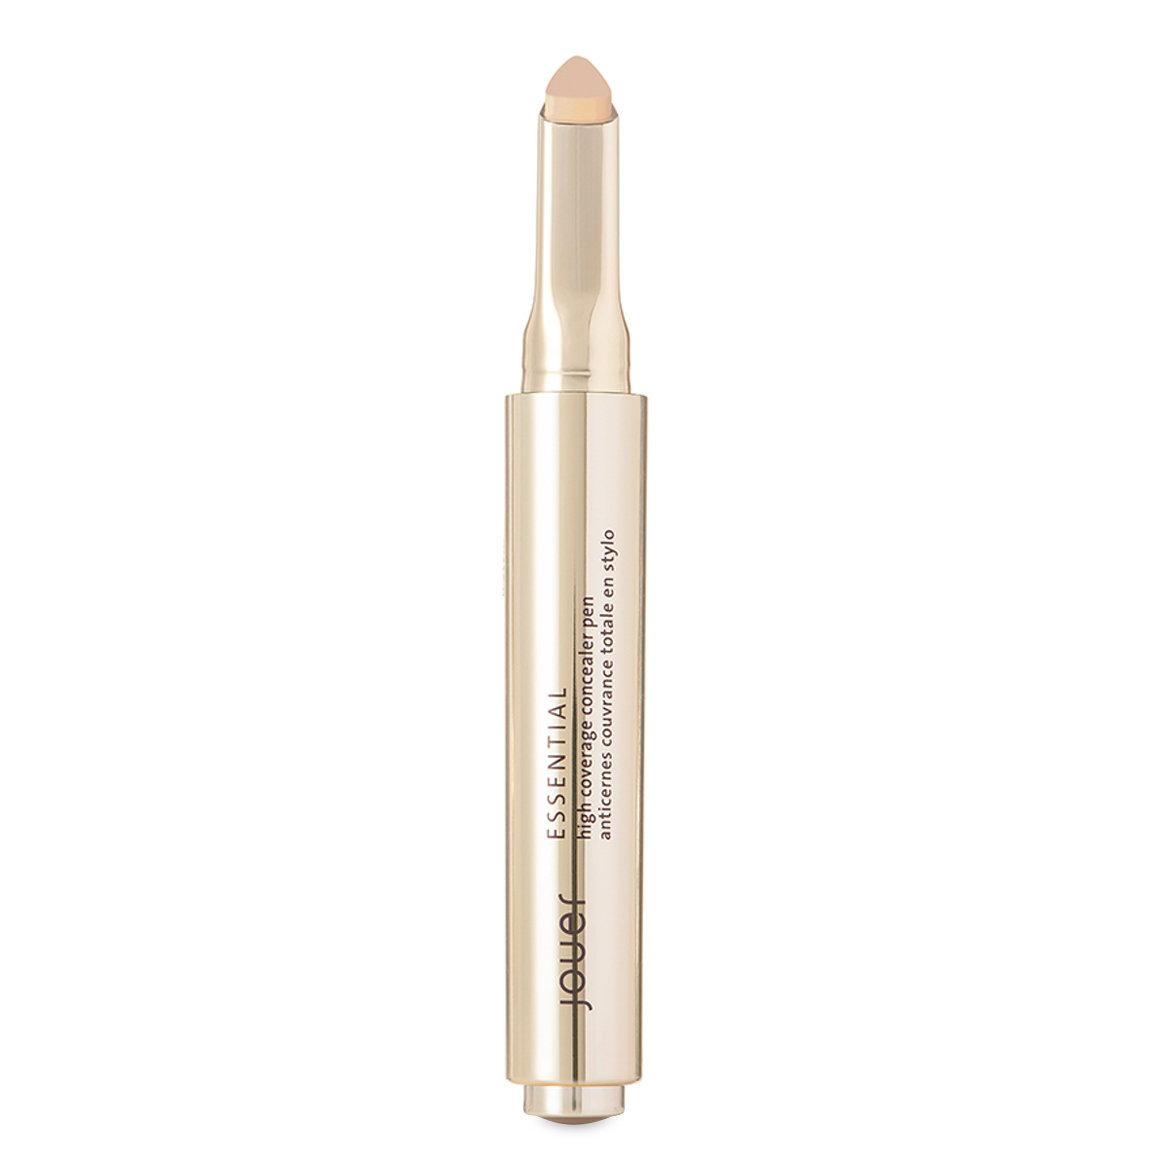 Jouer Cosmetics Essential High Coverage Concealer Pen Lace alternative view 1.